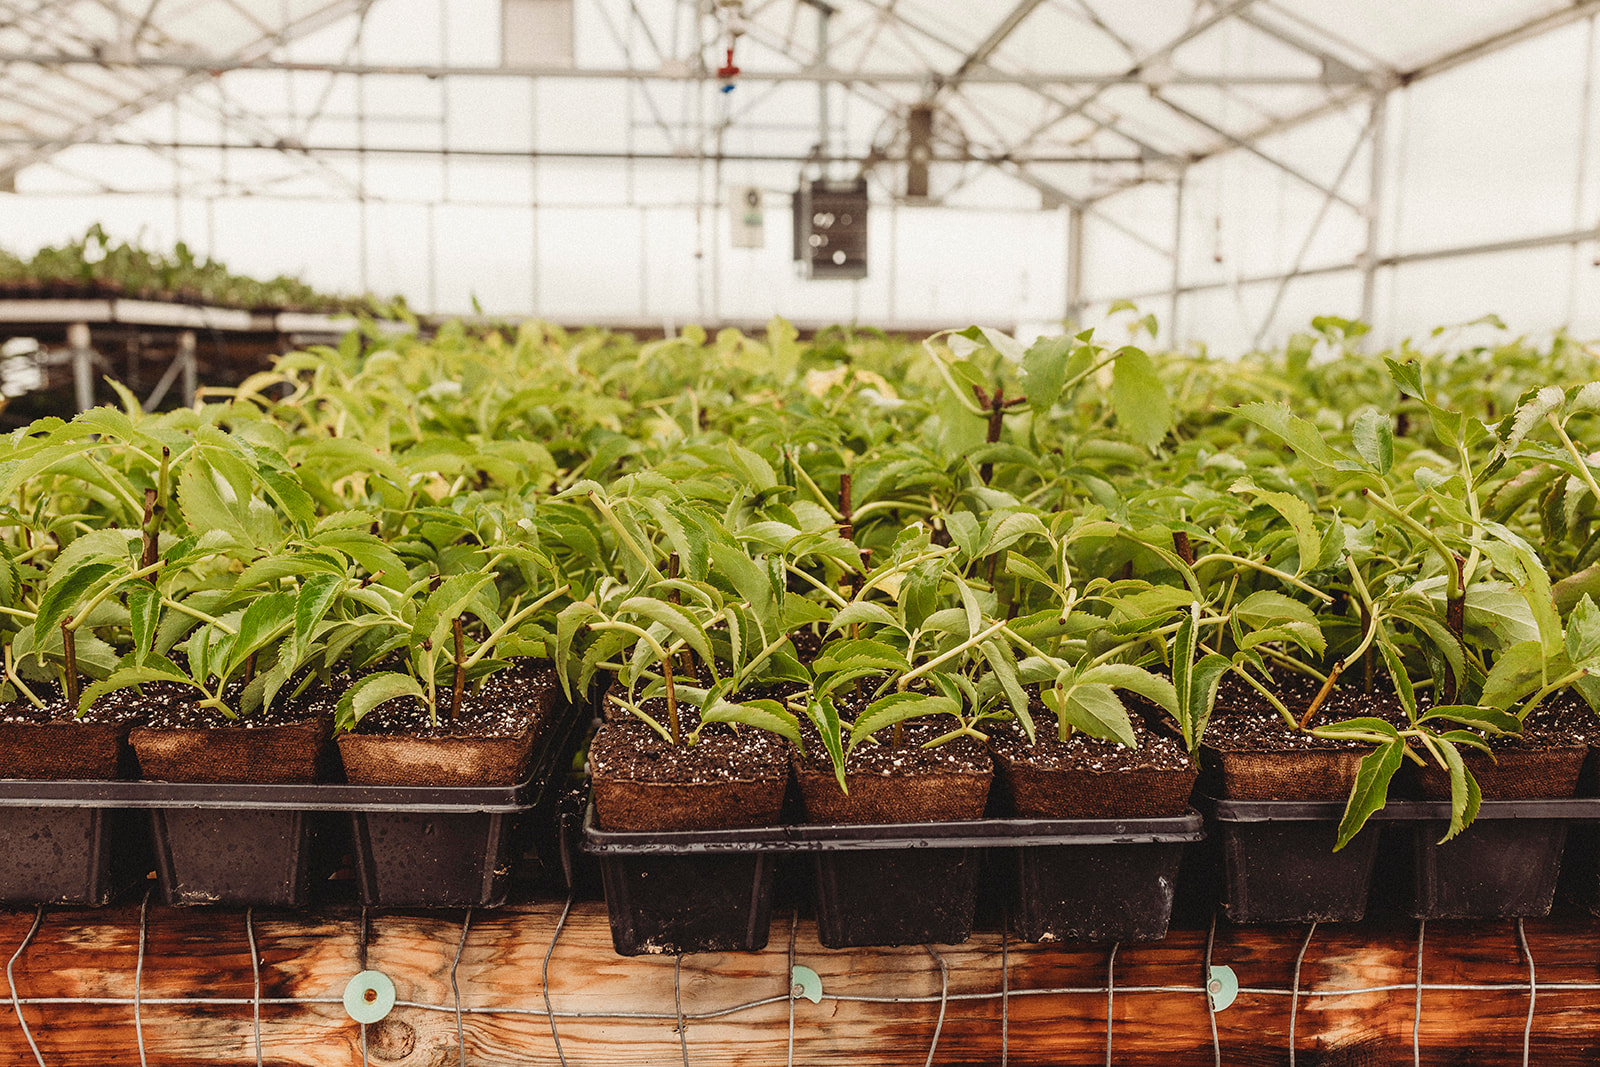 Norms Farm Greenhouse Elderberries